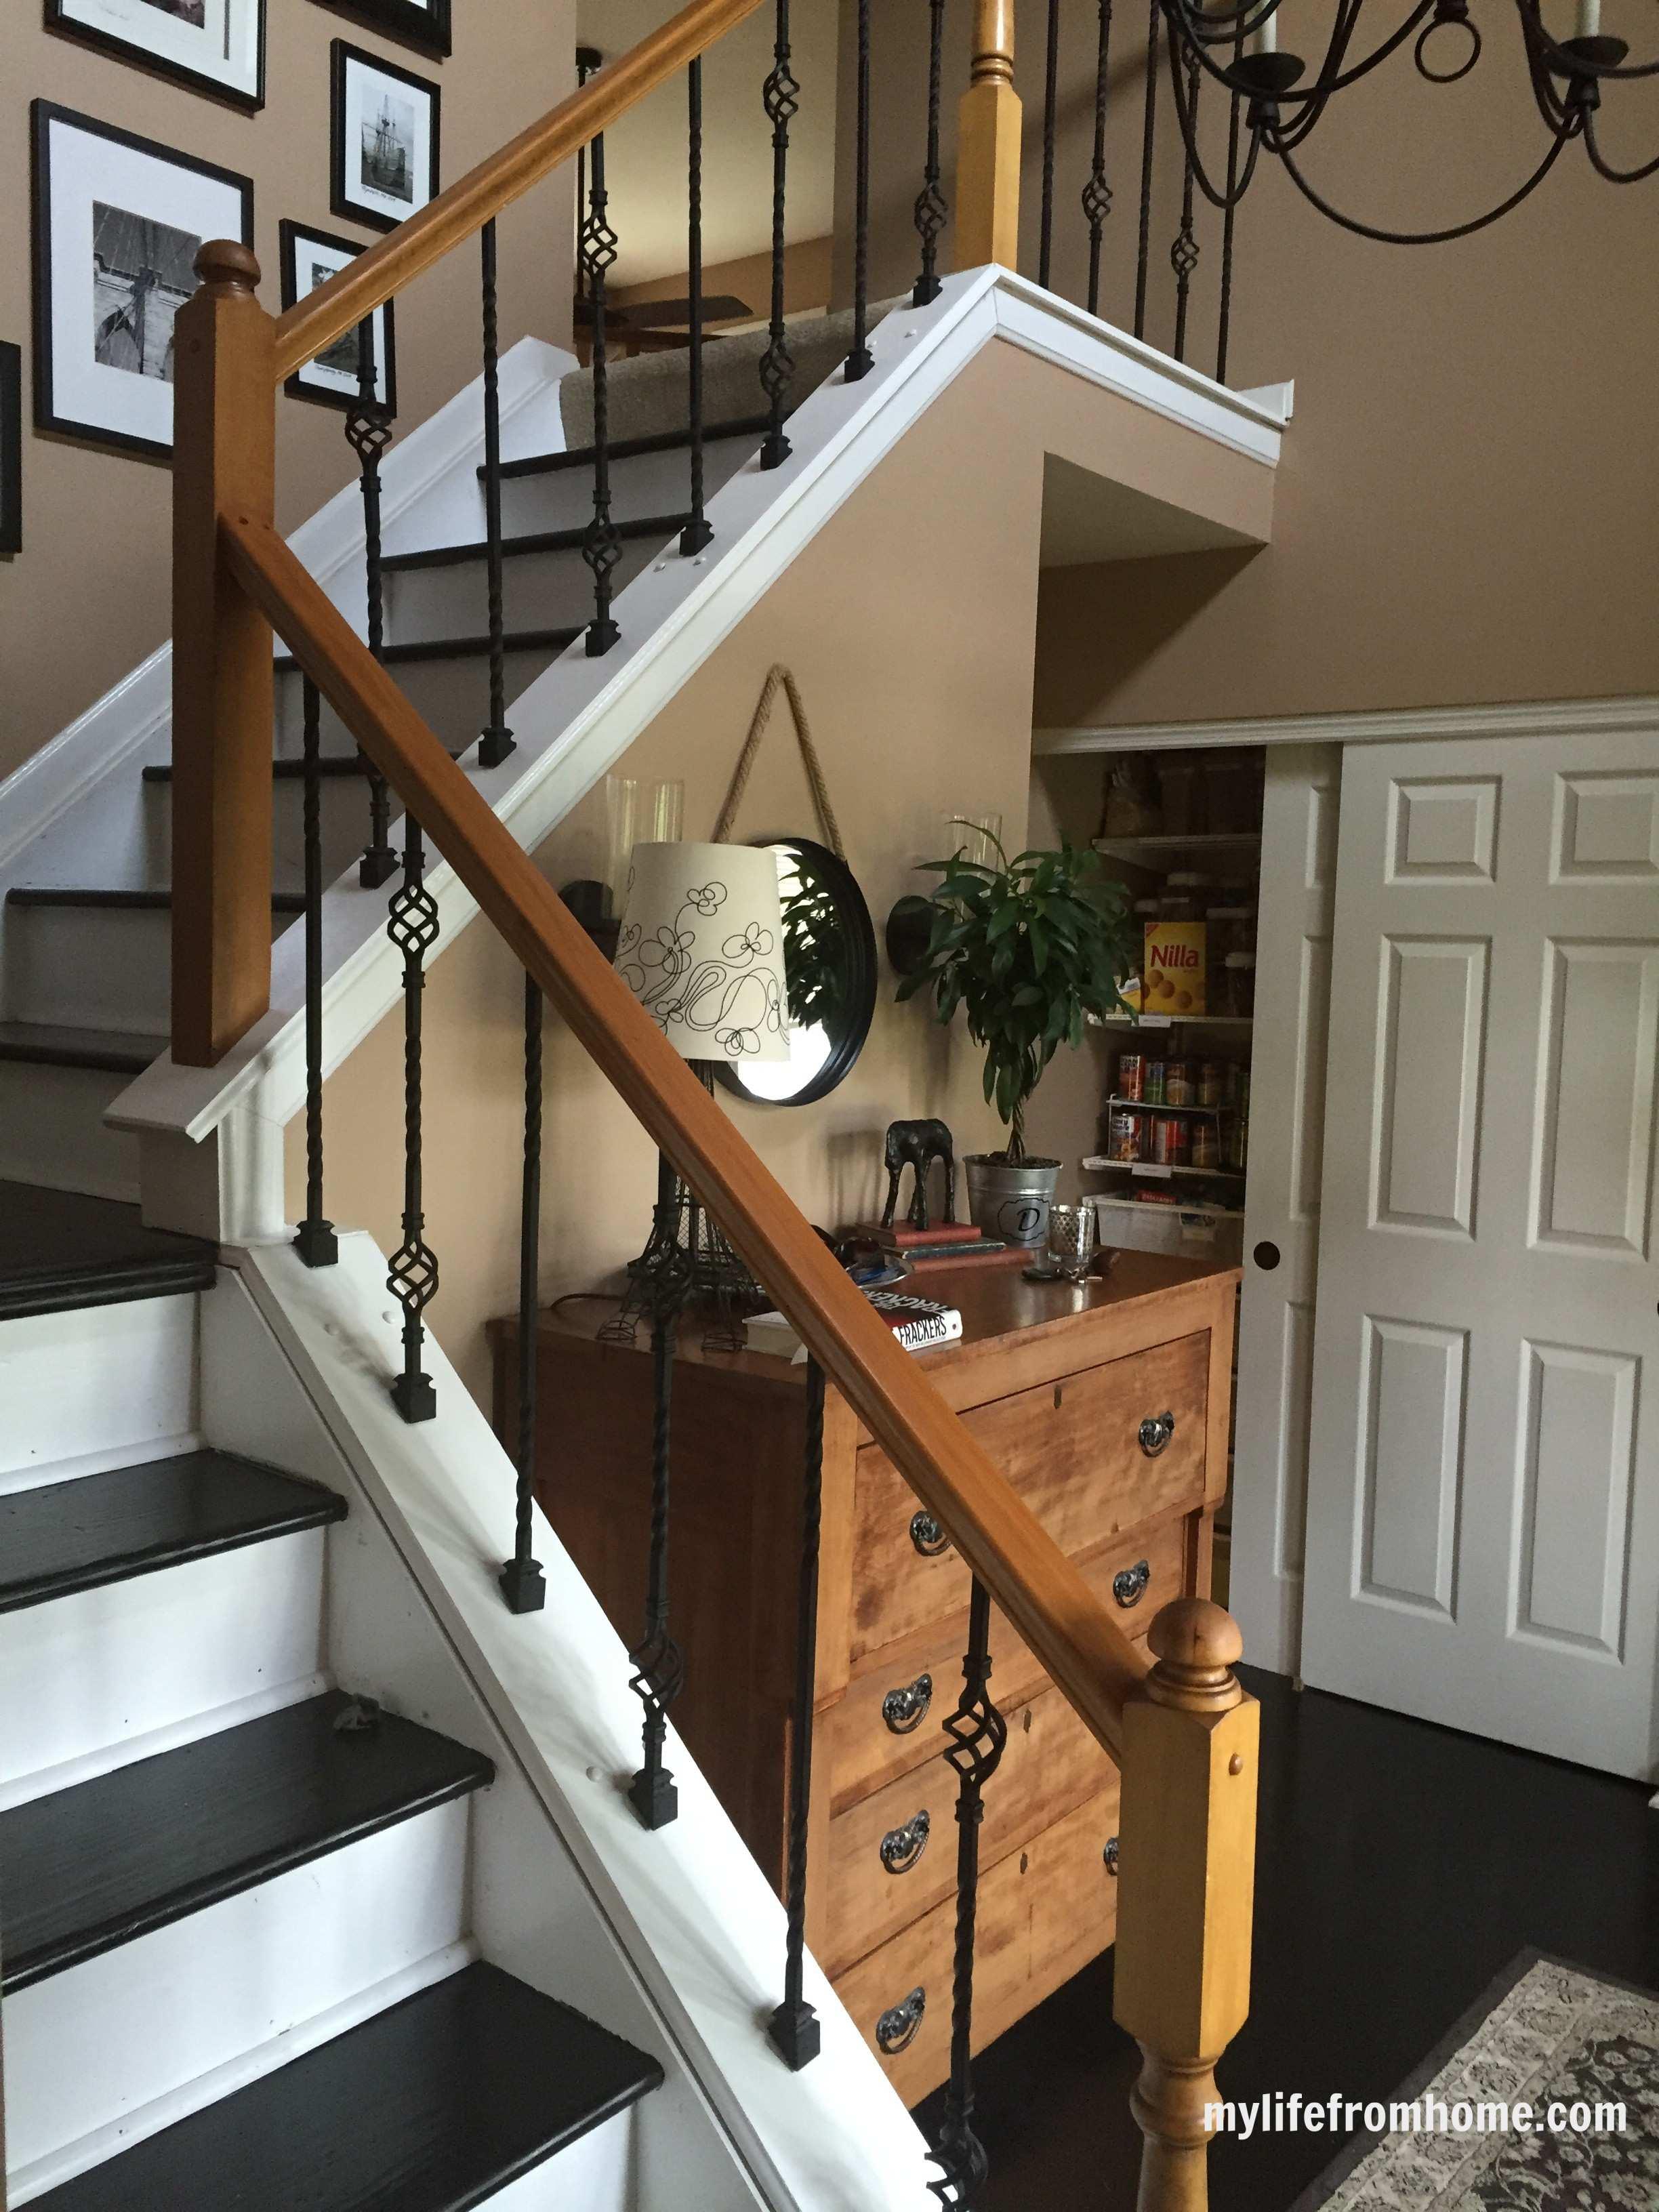 DIY Railings Adding Wrought Iron Spindles